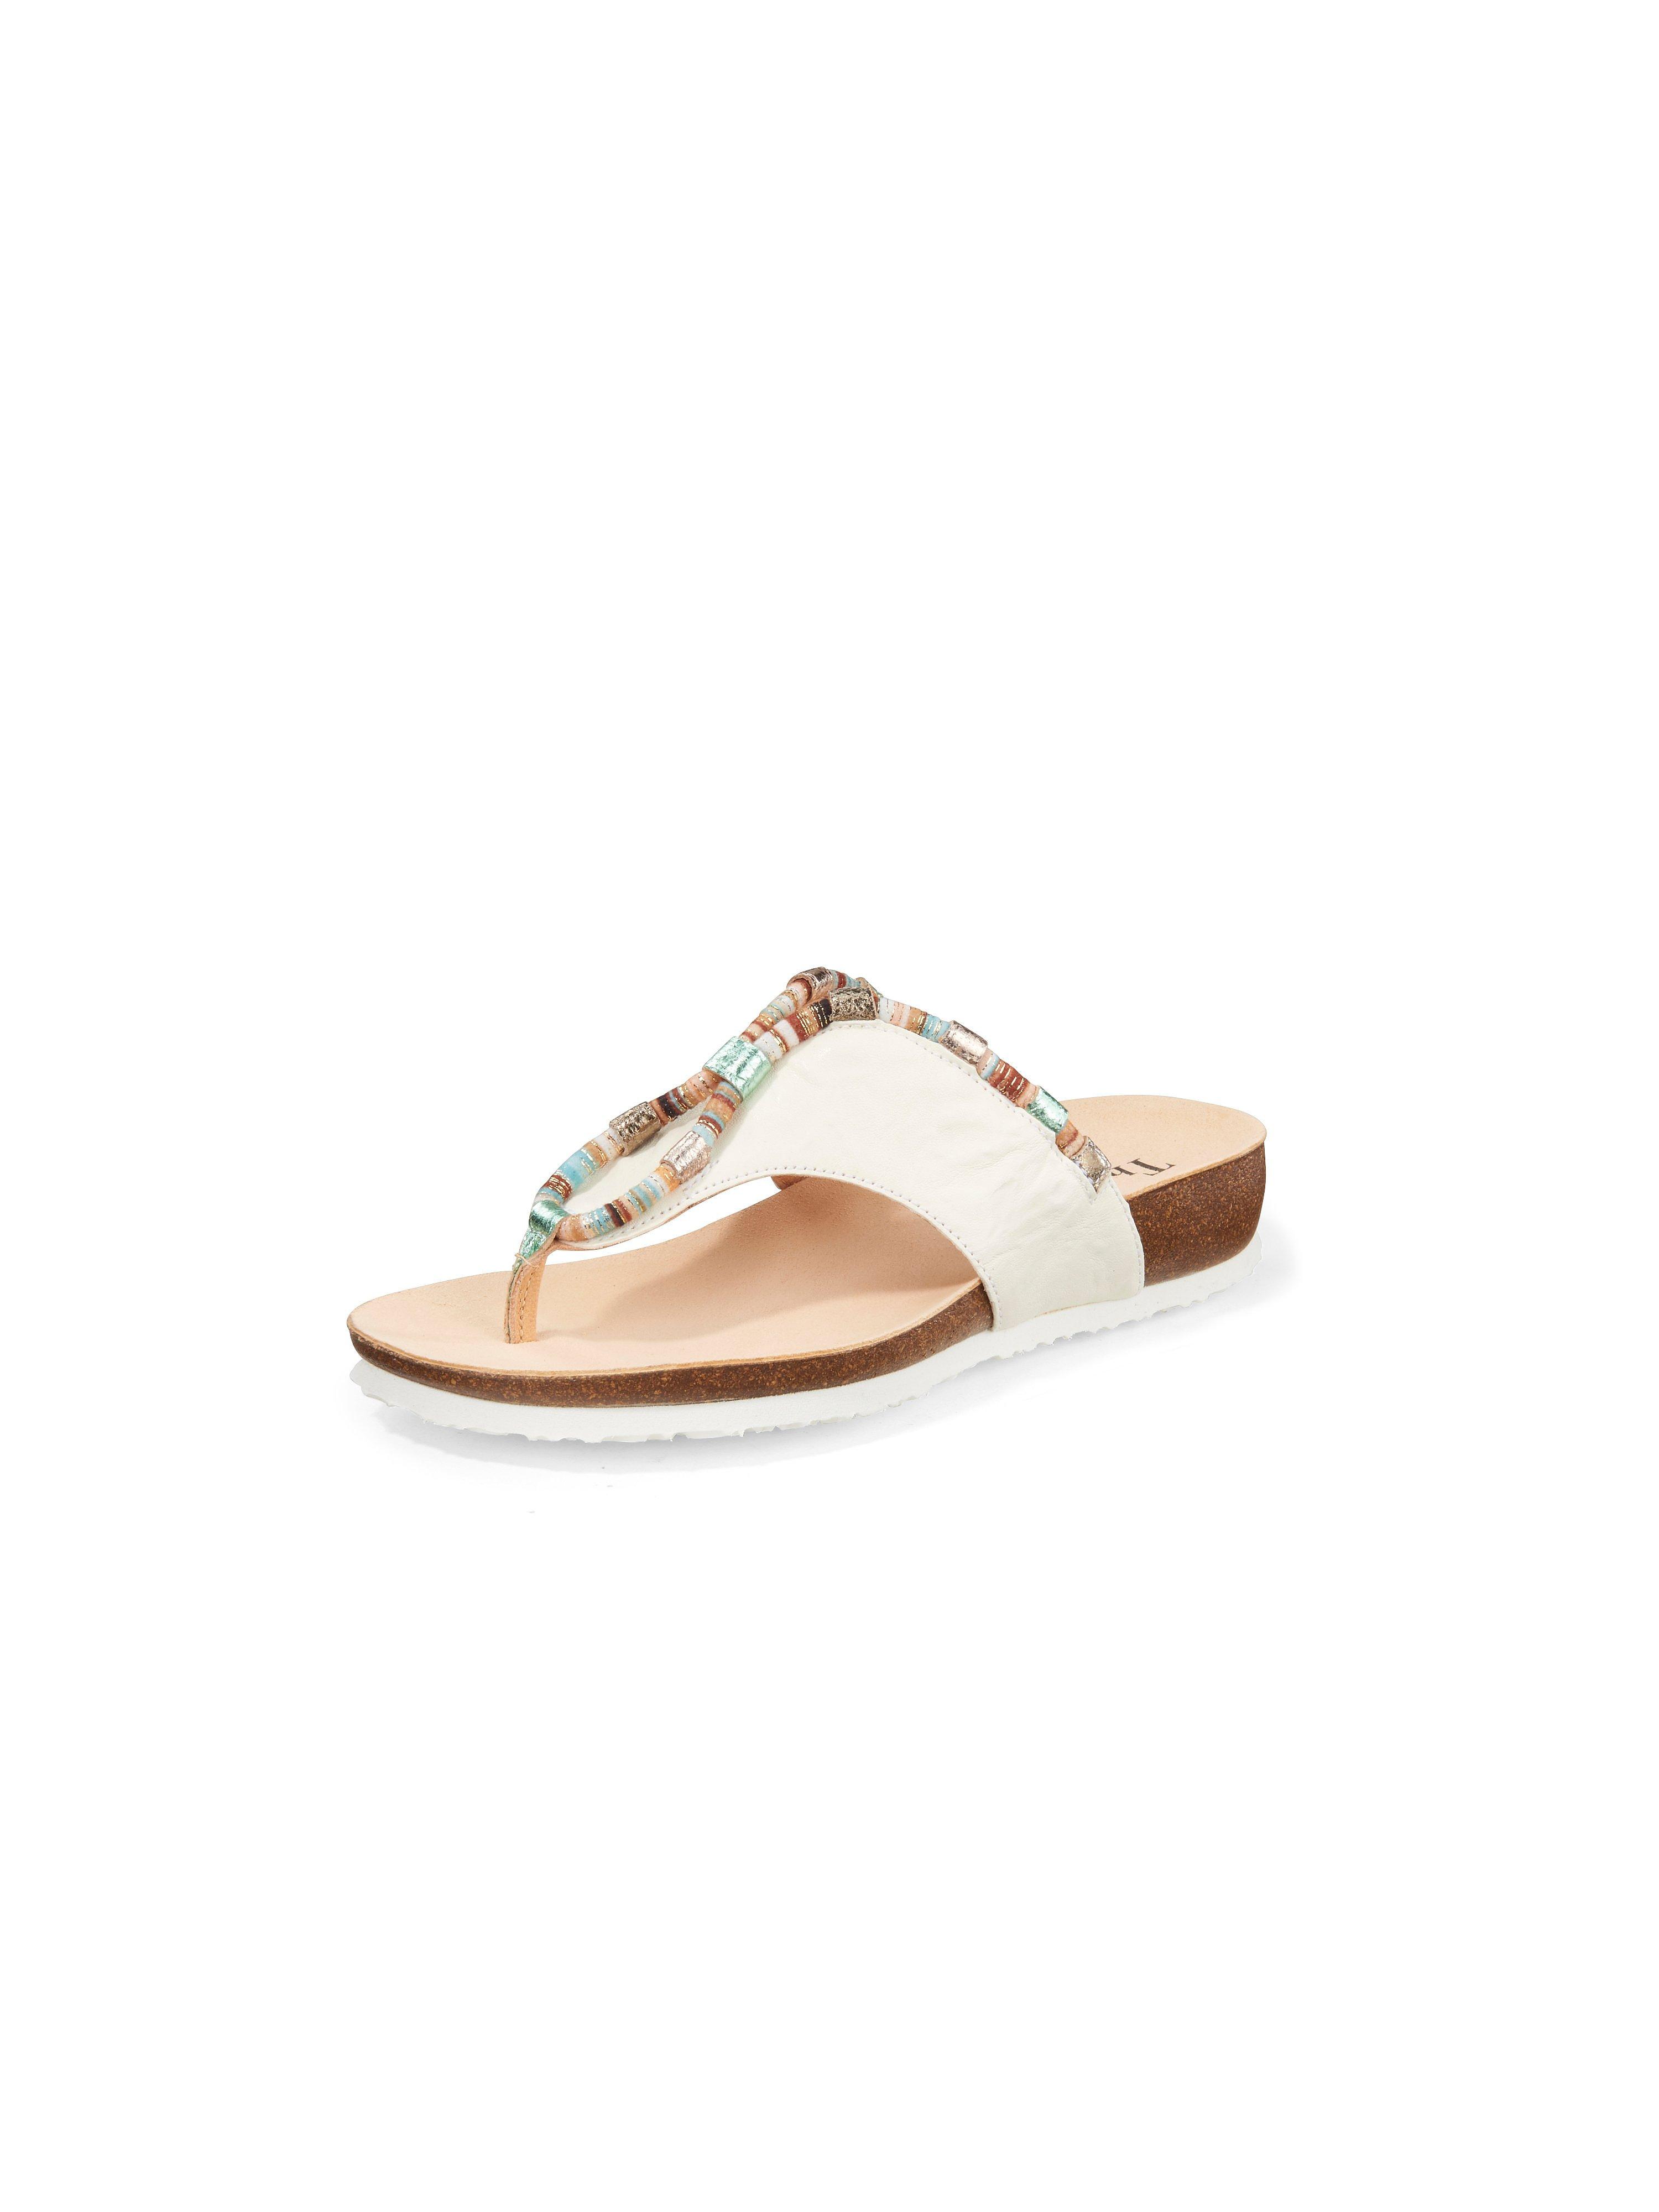 Thong sandals Julia Think! white